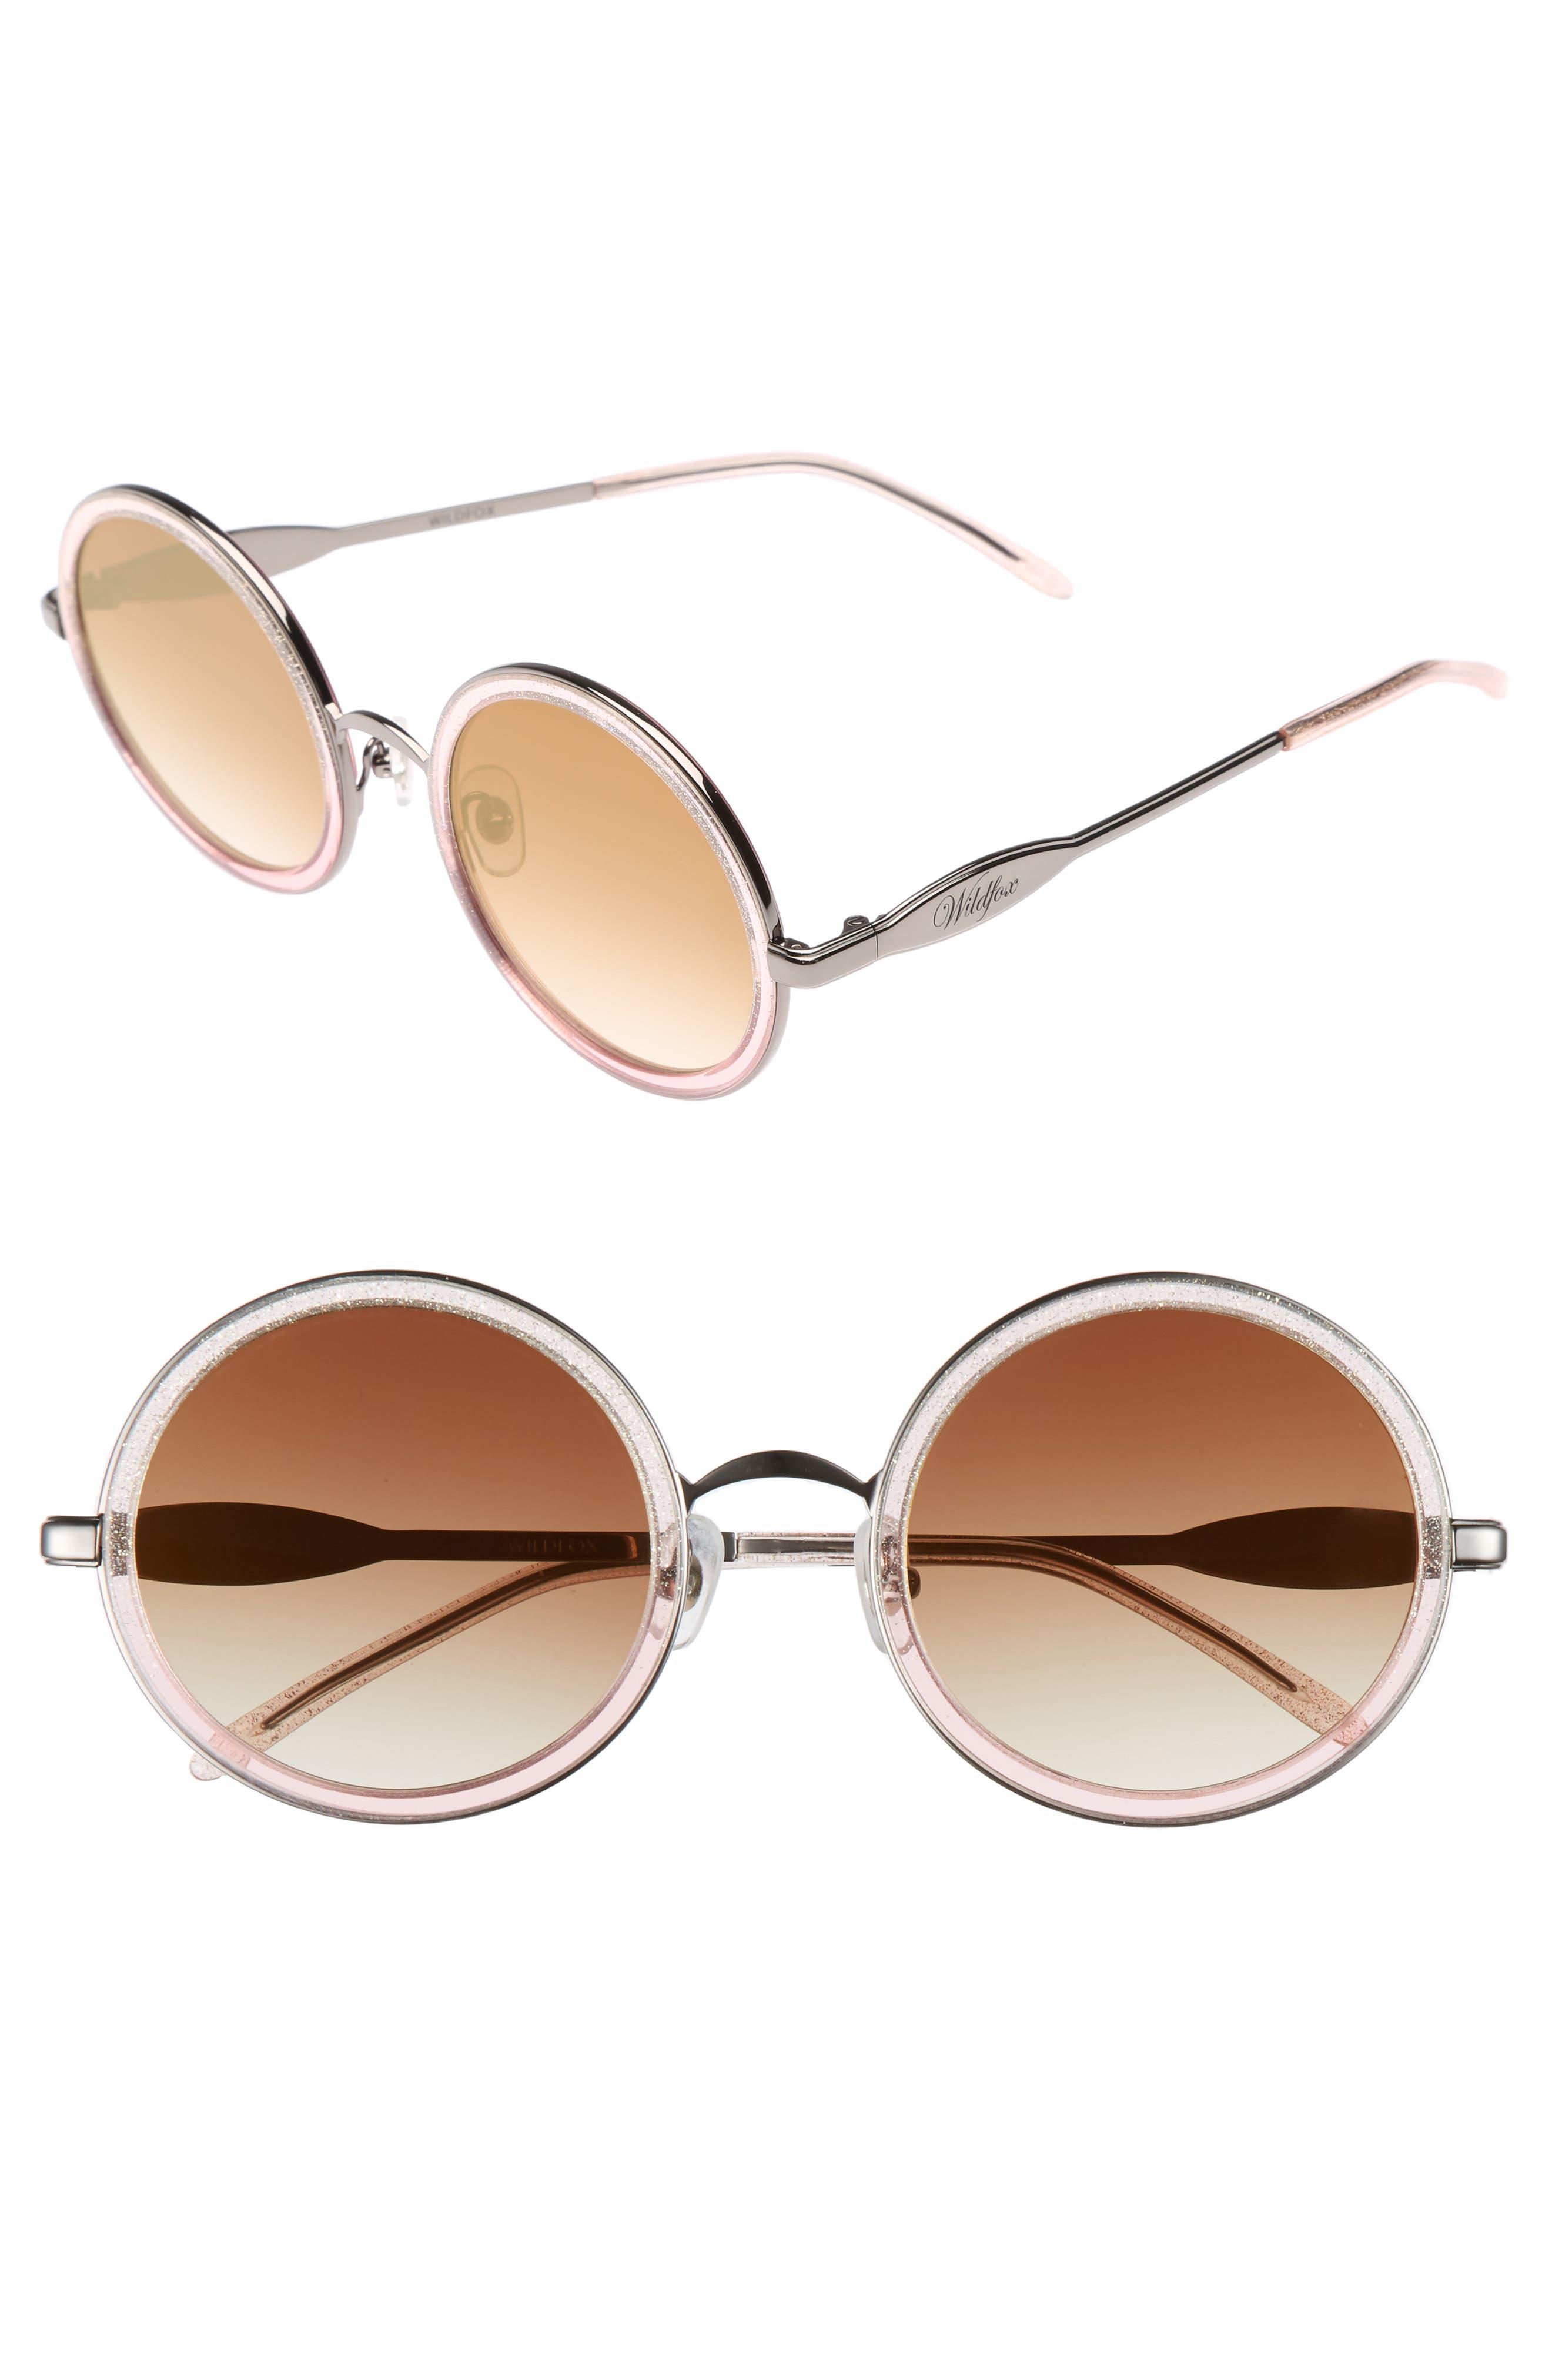 Ryder Zero 49mm Flat Round Sunglasses,                         Main,                         color, GLITZ